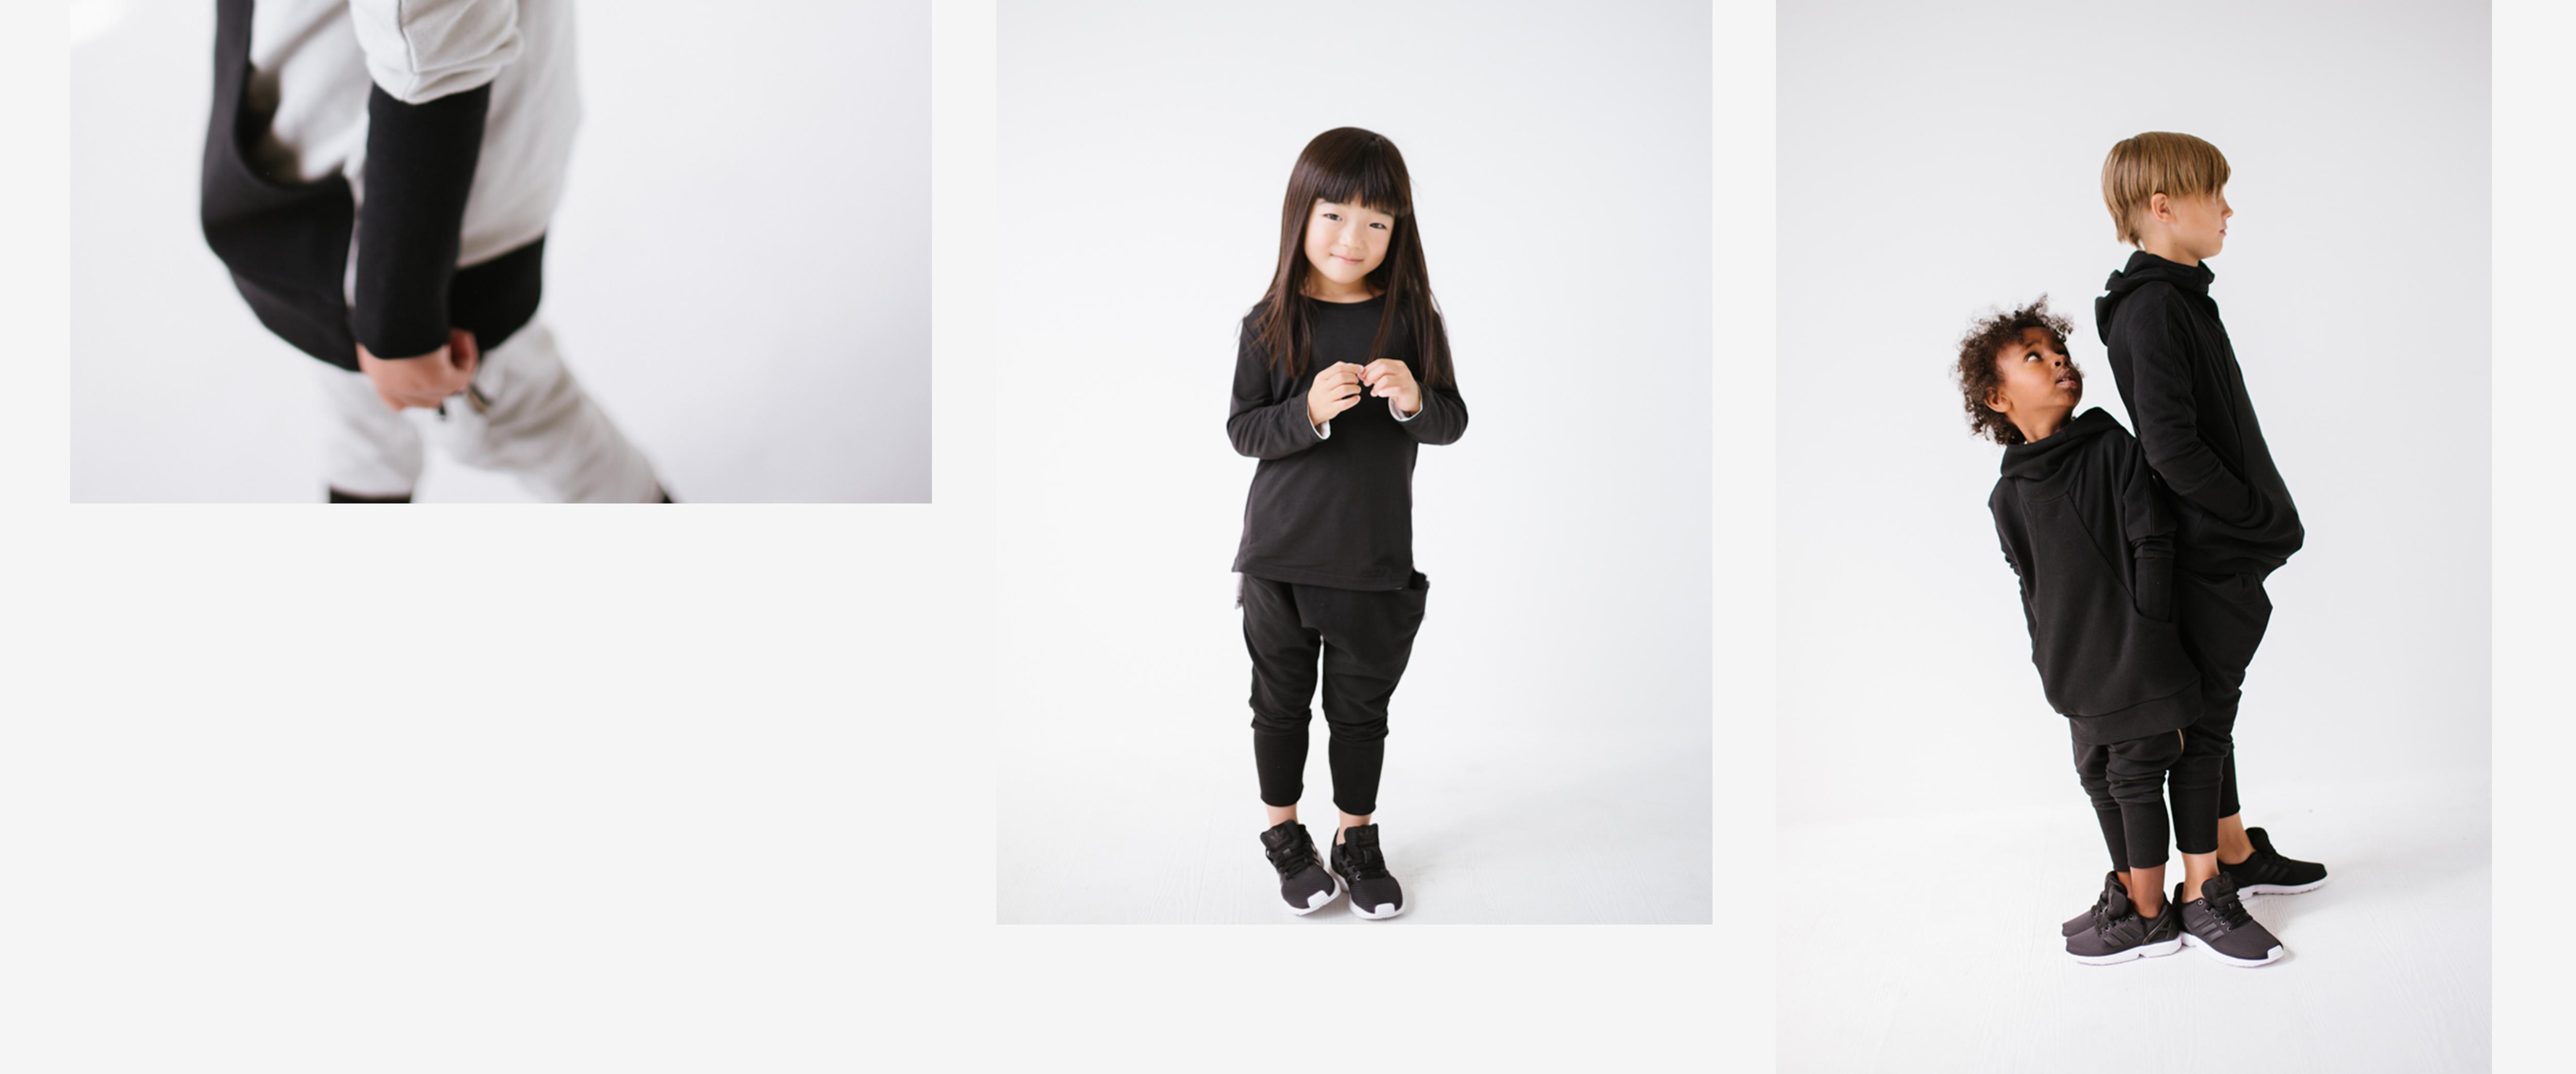 Garmentory-kids-enhanced-profile-banners4_age-to-come-apparel